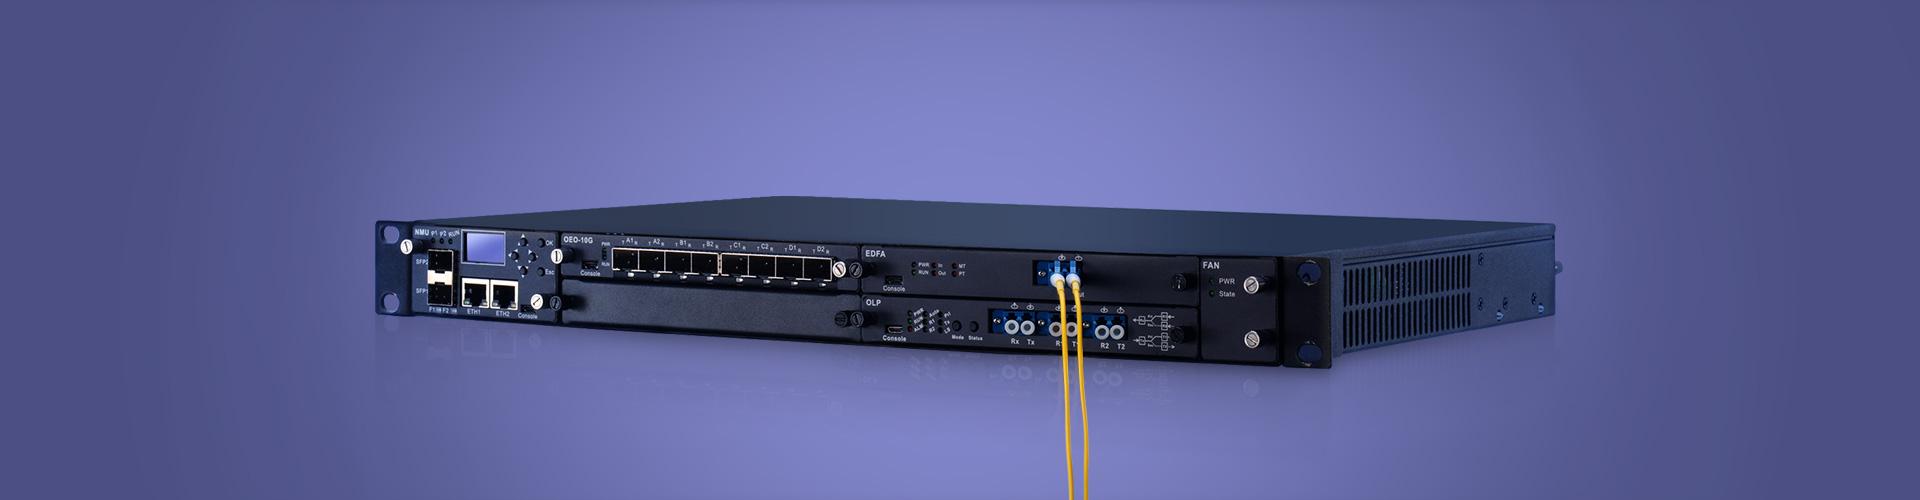 fs network_series_03.jpg